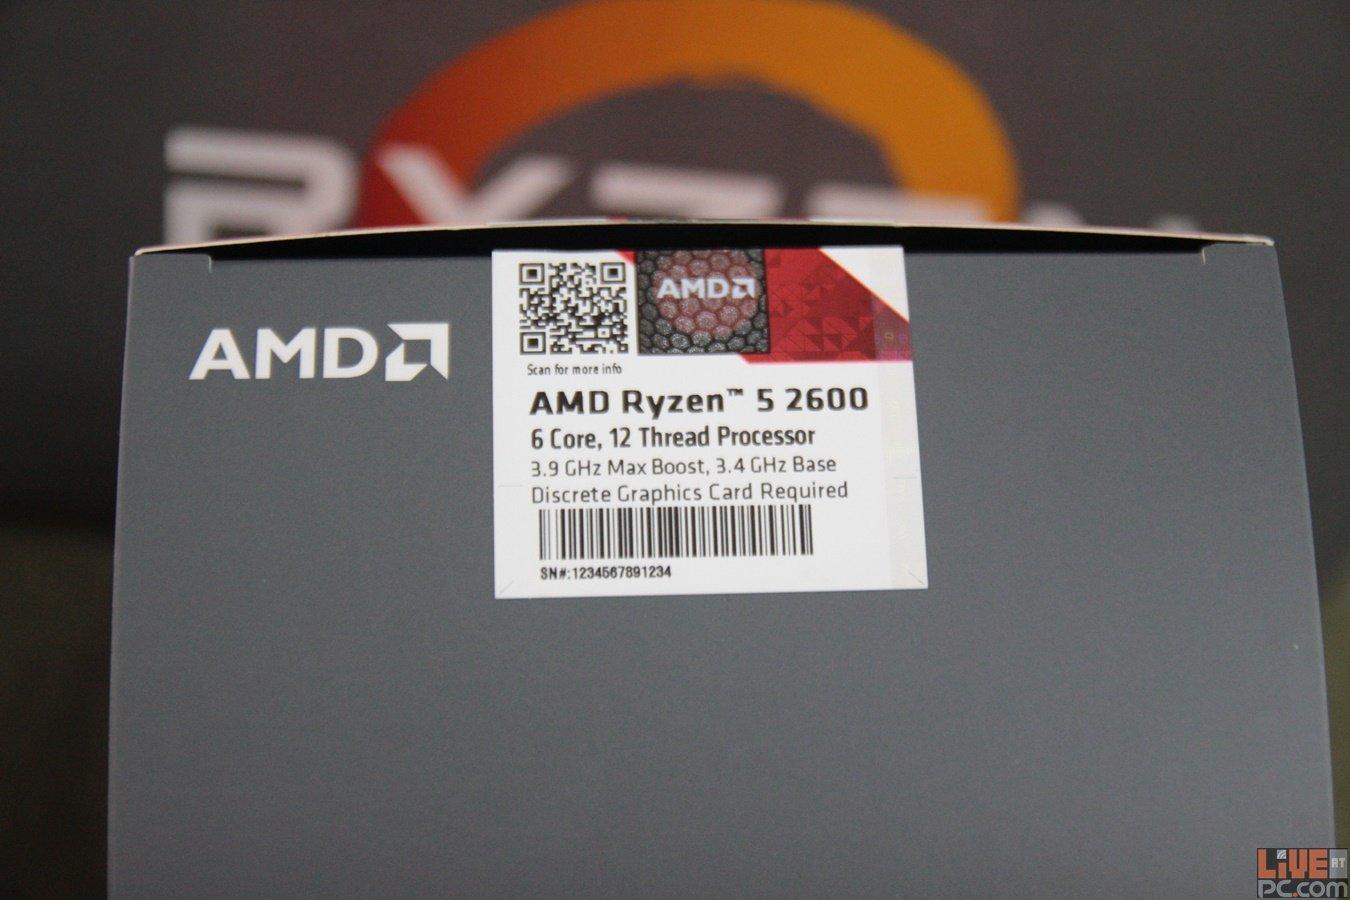 Review: AMD Ryzen 5 2600 - Perfect for Home | LiveatPC com